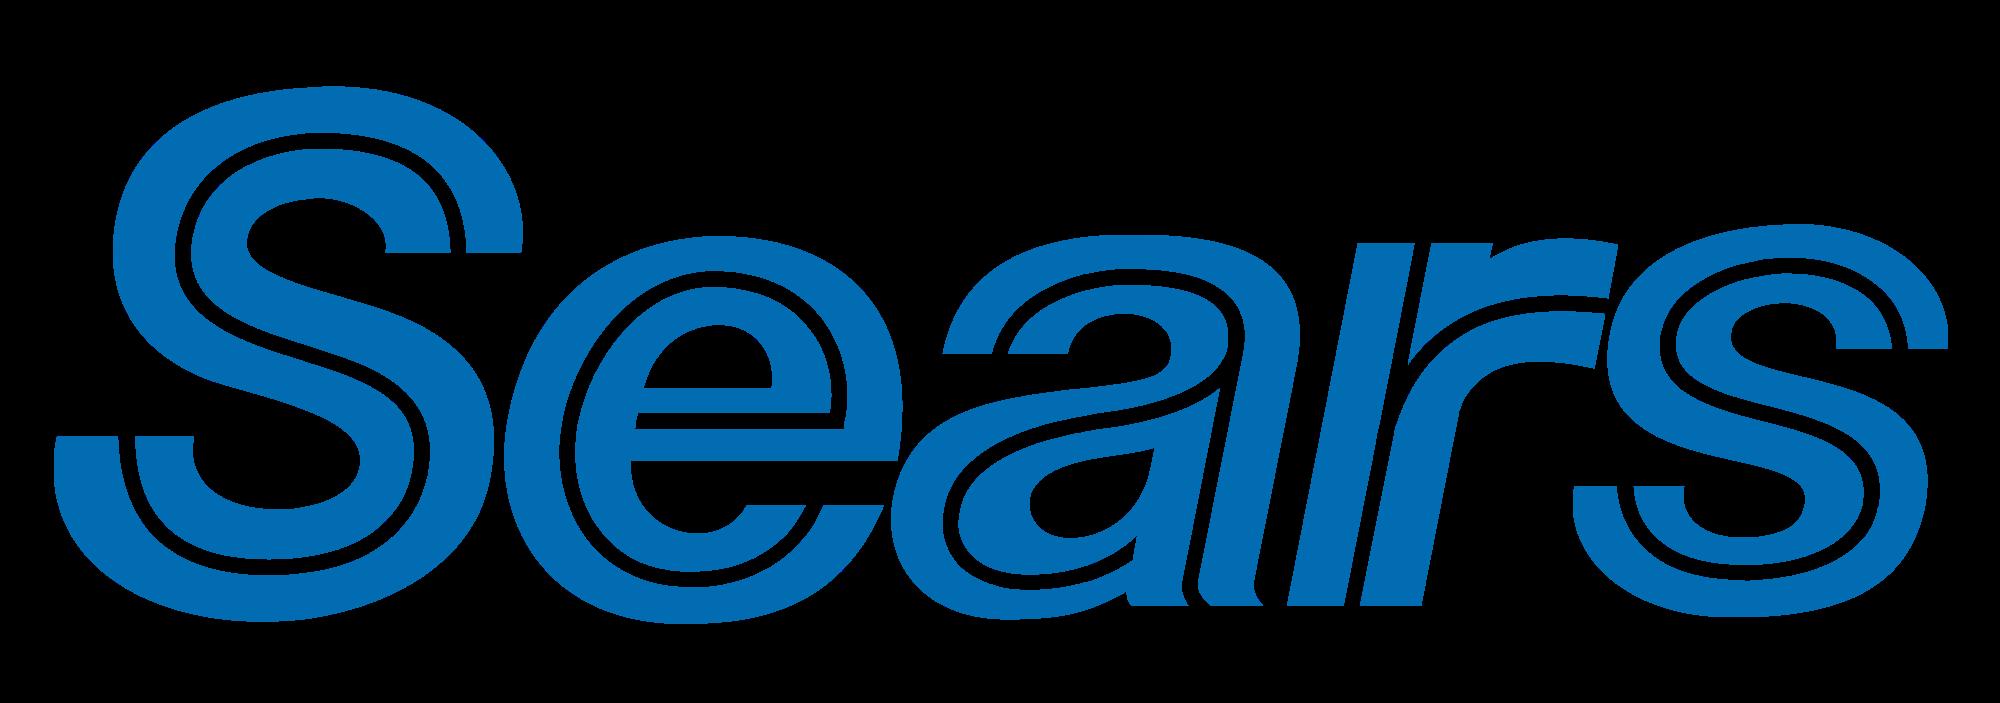 Sears Logo Transparent Google Search Home Improvement Sears Improve